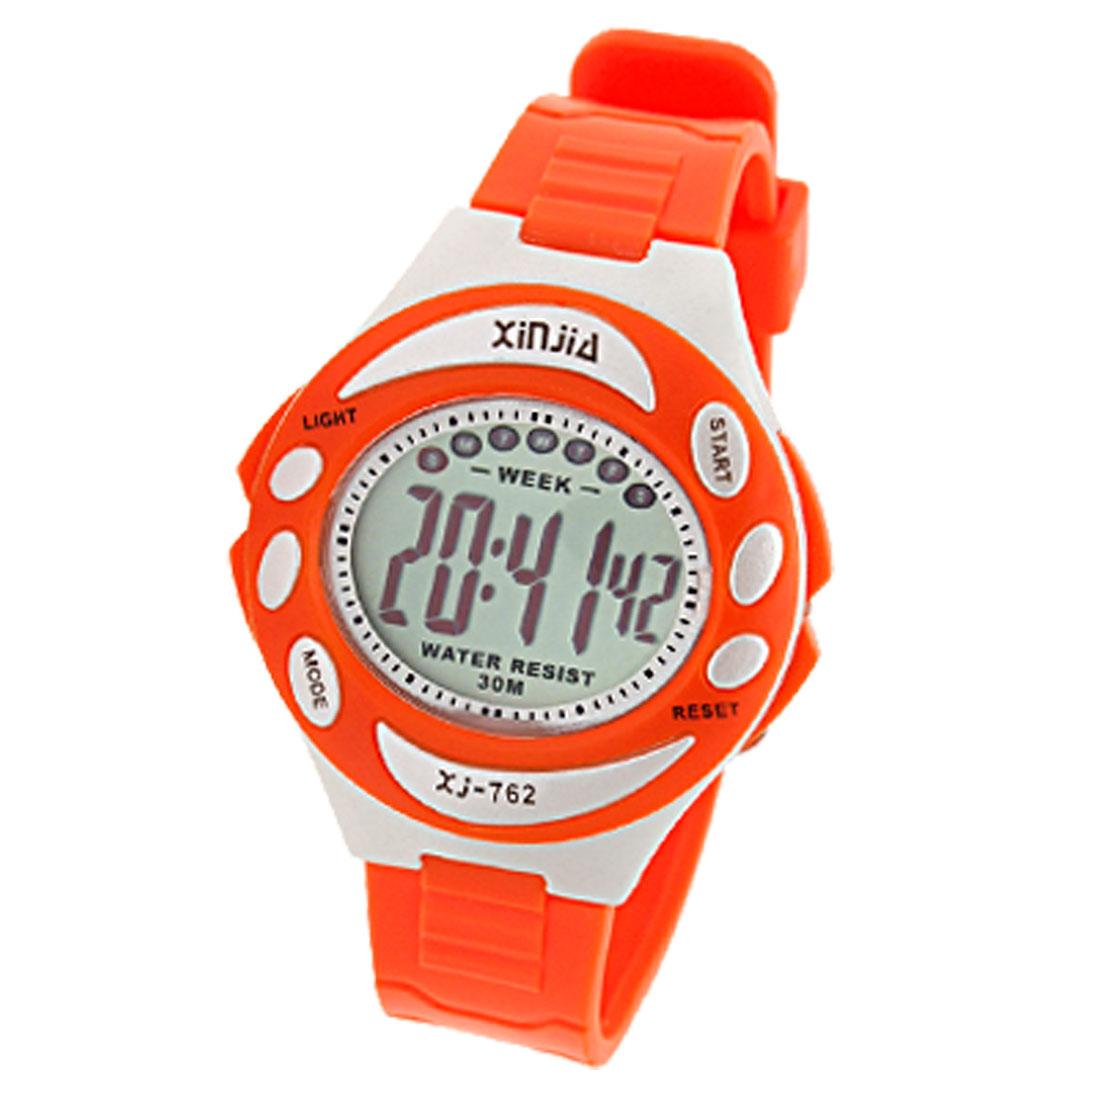 Girls Digital Sports Wrist Watch Orange with Cold Light